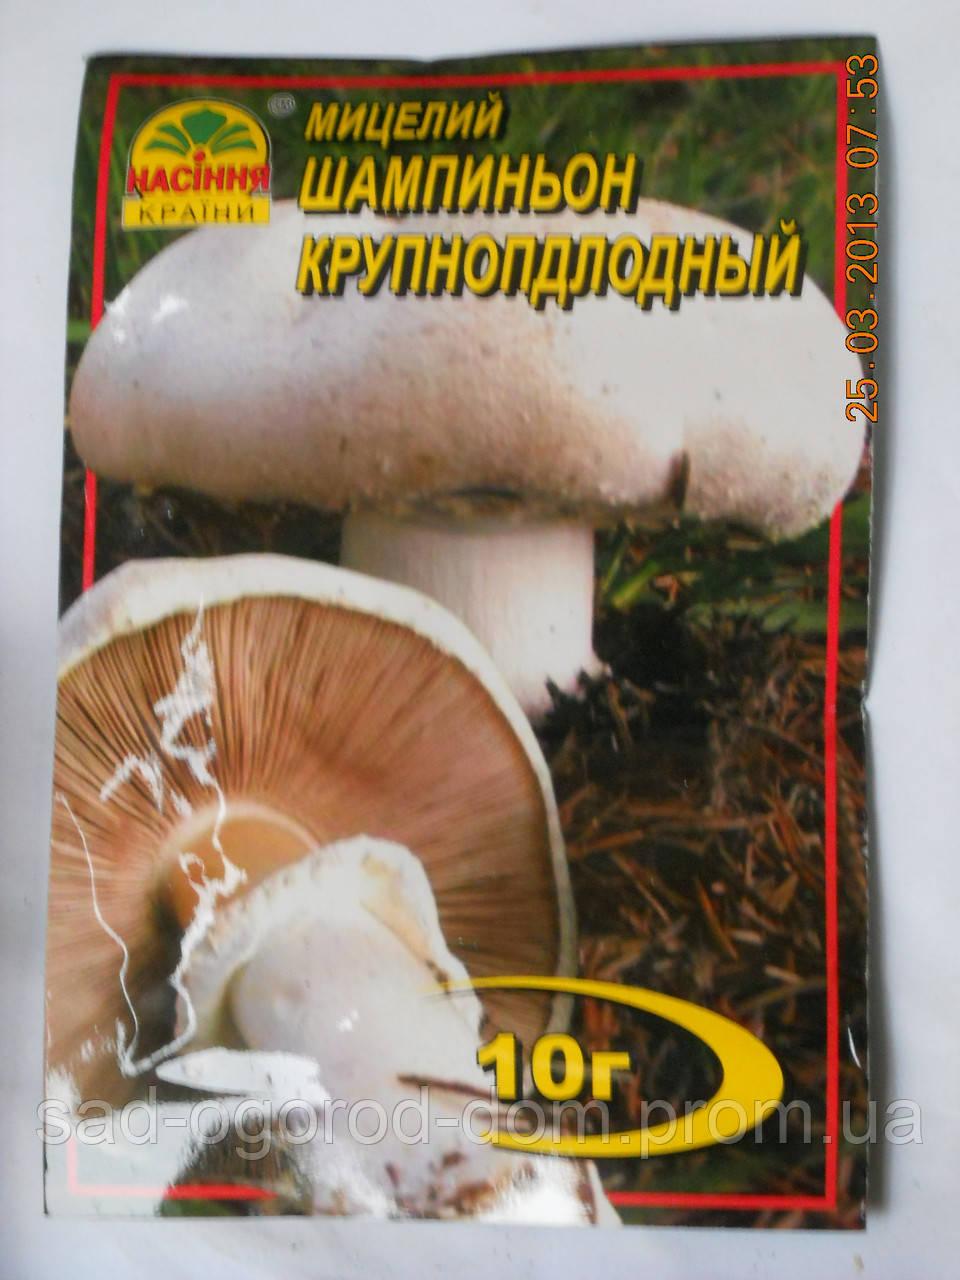 Мицелий Шампиньона Крупноплодного